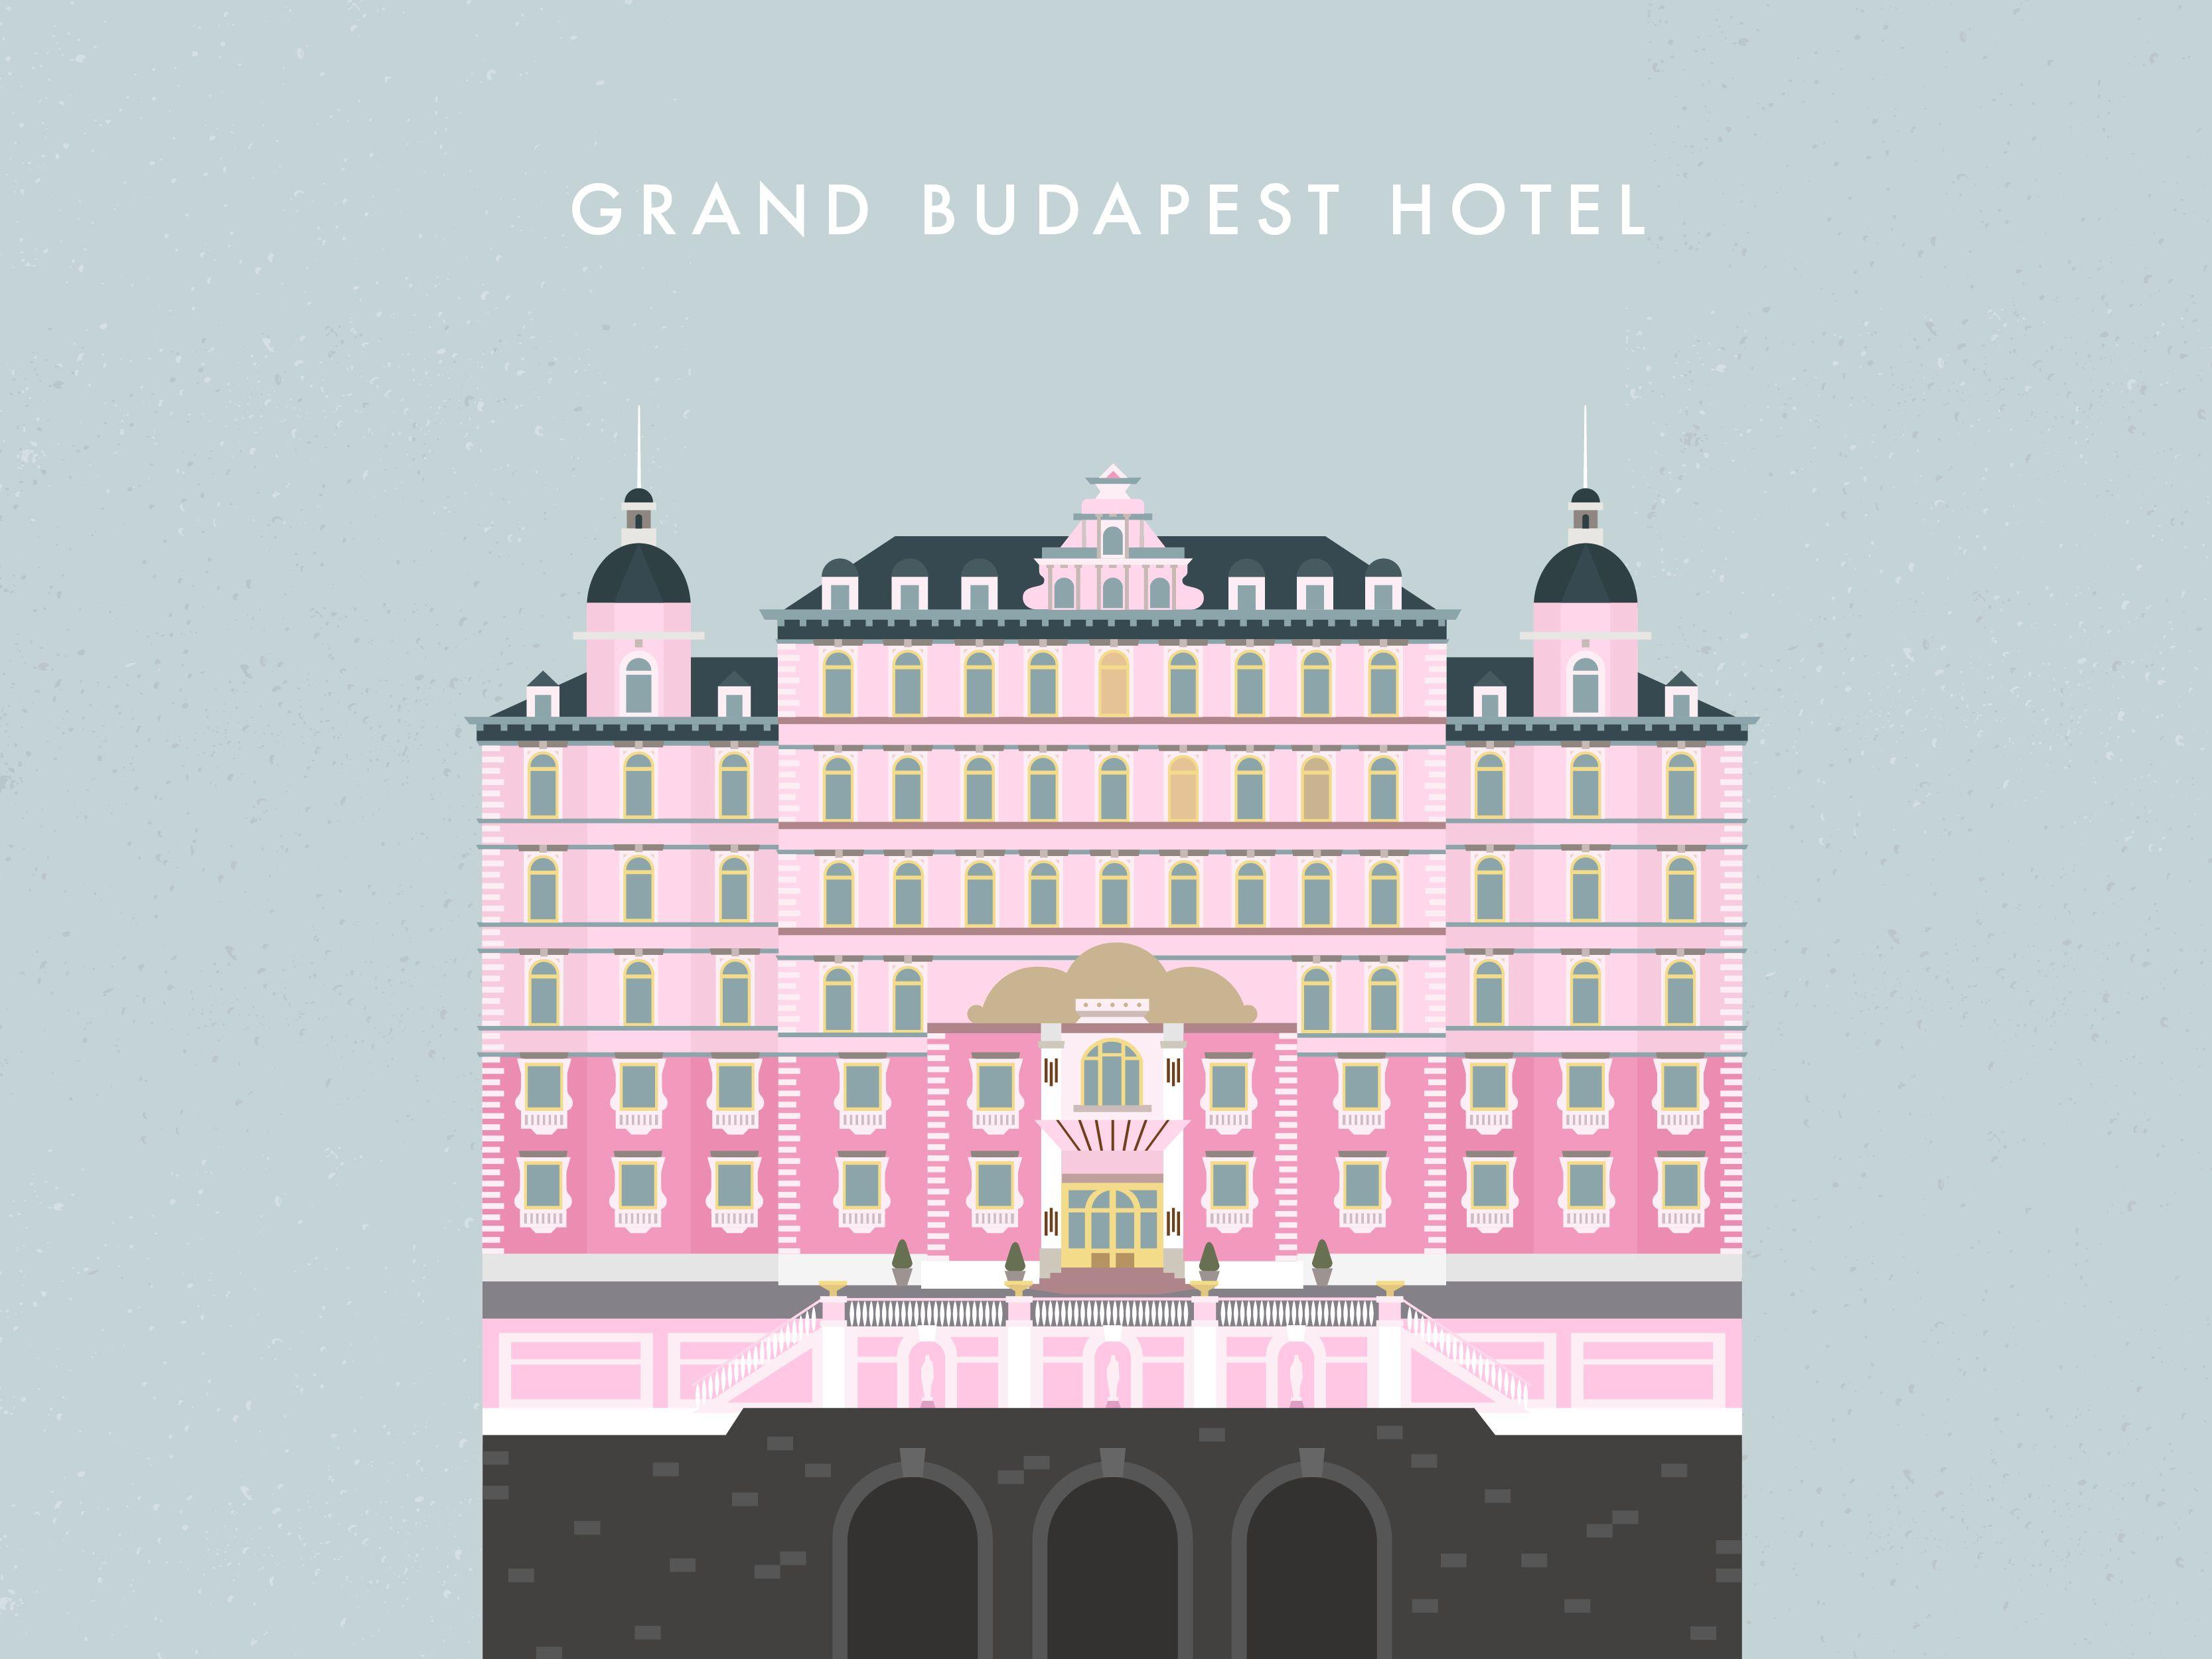 Pin By Kelsey Davis On Inspiring Stimulates Creativity Grand Budapest Hotel Budapest Hotel Grand Budapest